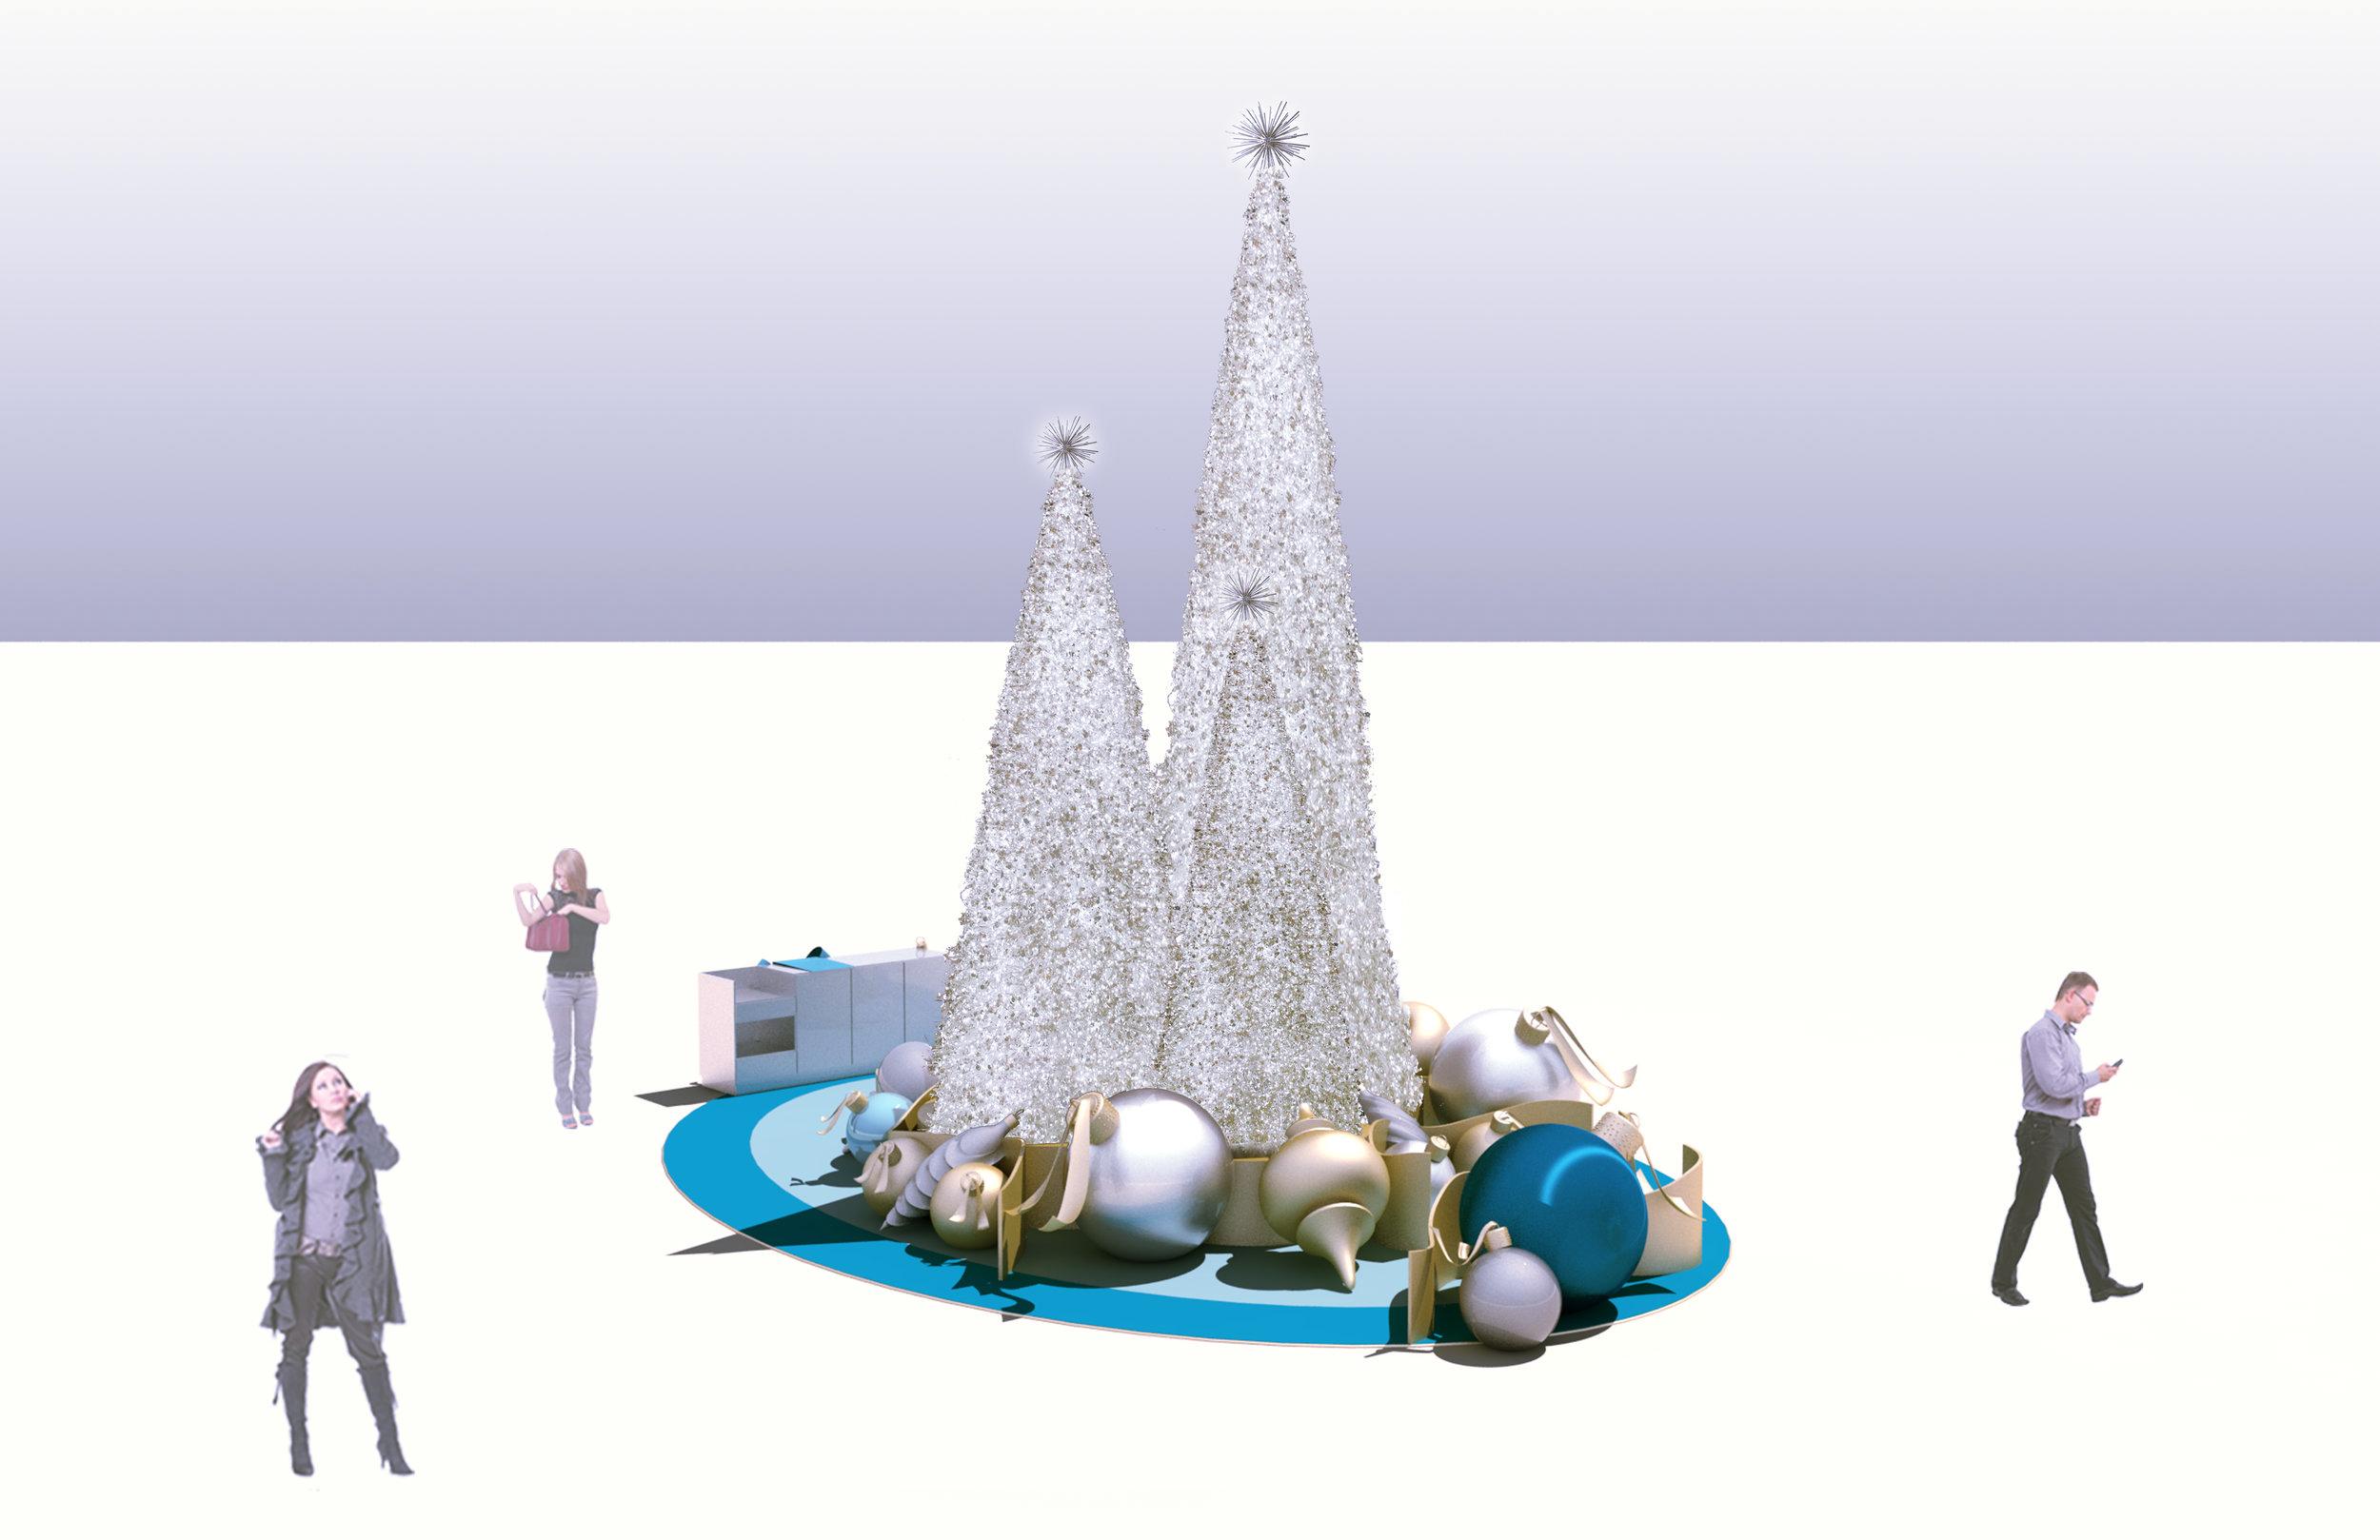 carlsbad holiday rendering 2.jpg